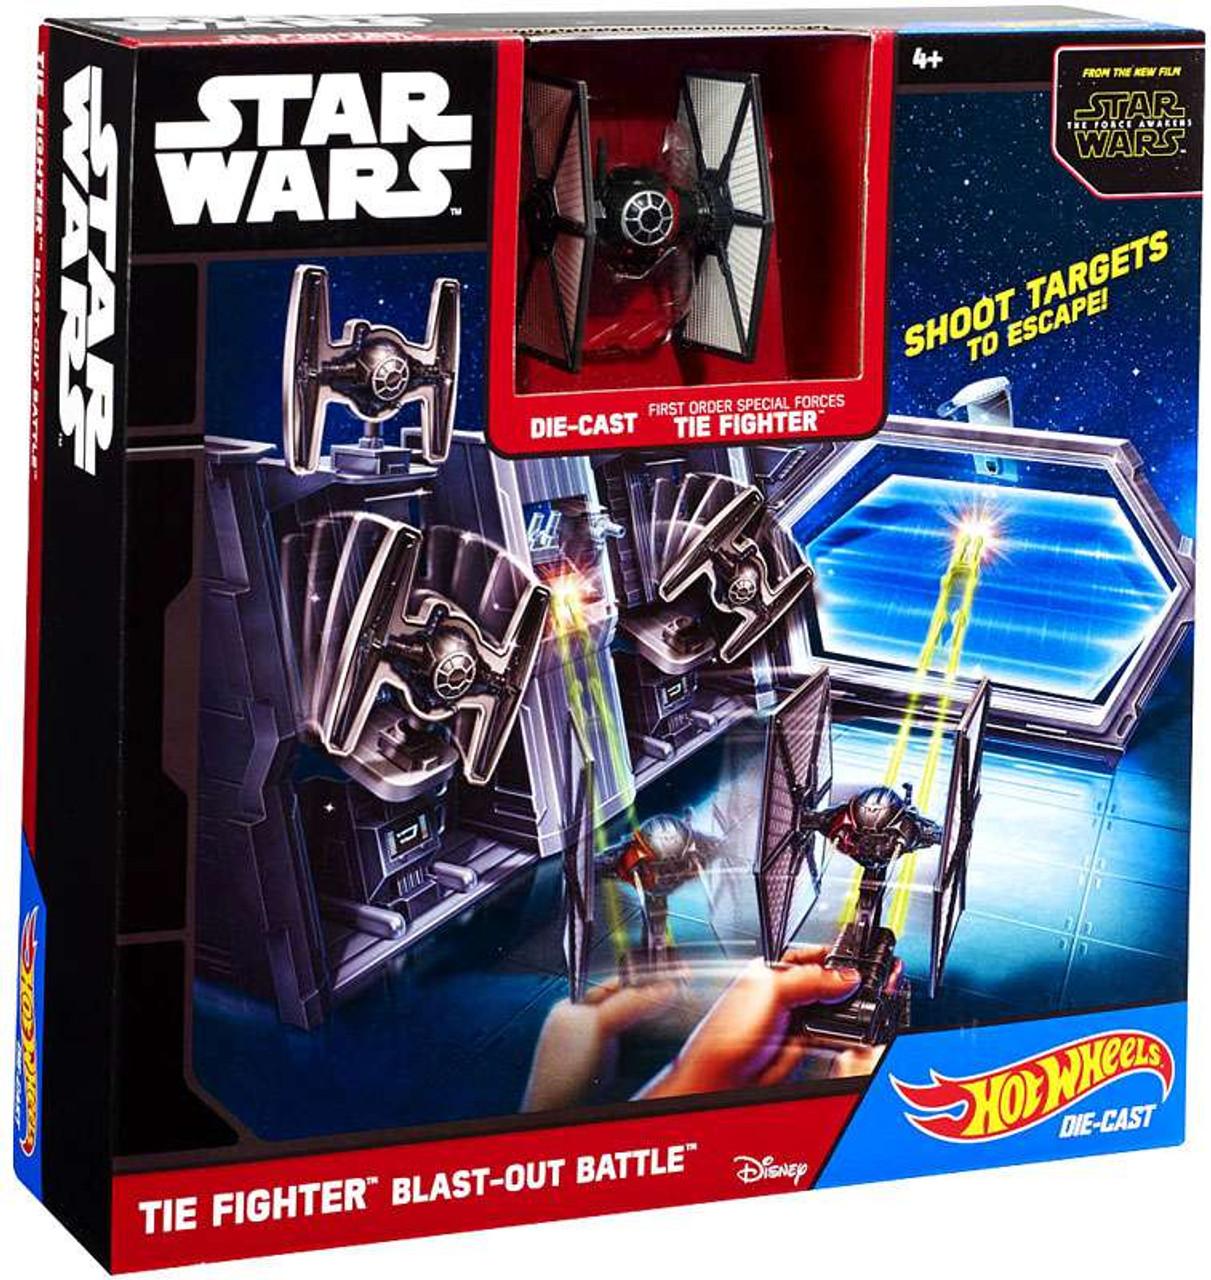 ba00deaa6917 Star Wars The Force Awakens Hot Wheels Tie Fighter Blast-Out Battle Playset  Mattel Toys - ToyWiz